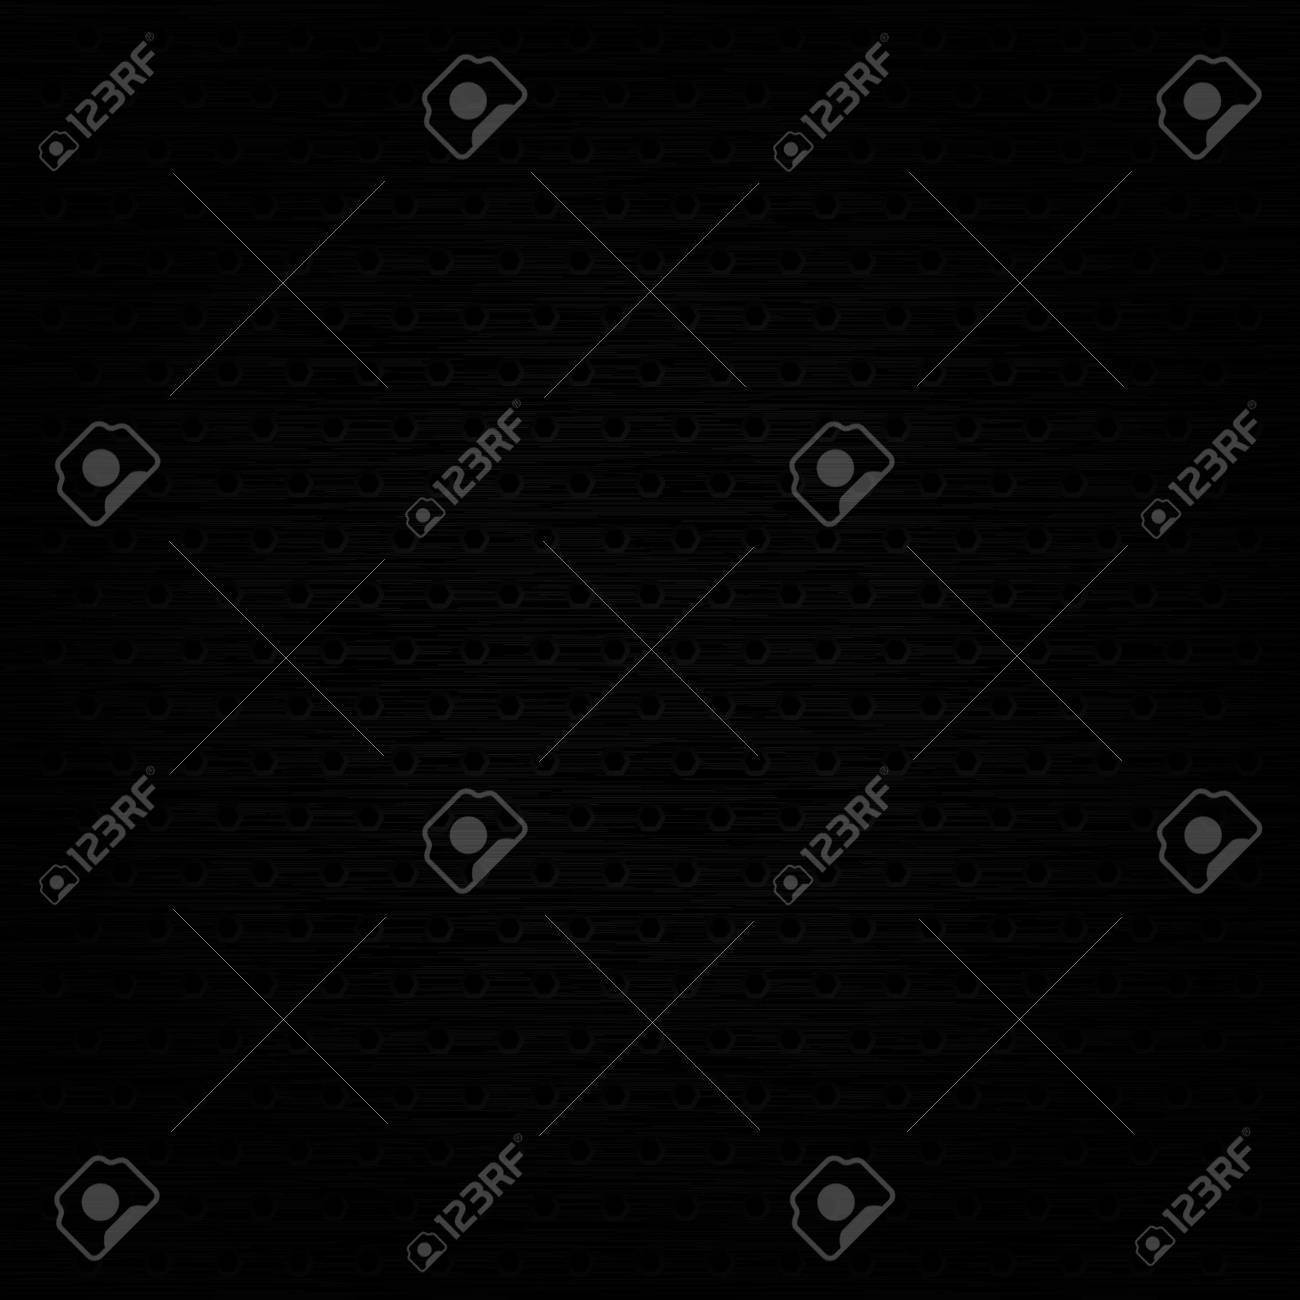 Carbon texture Stock Vector - 17314200